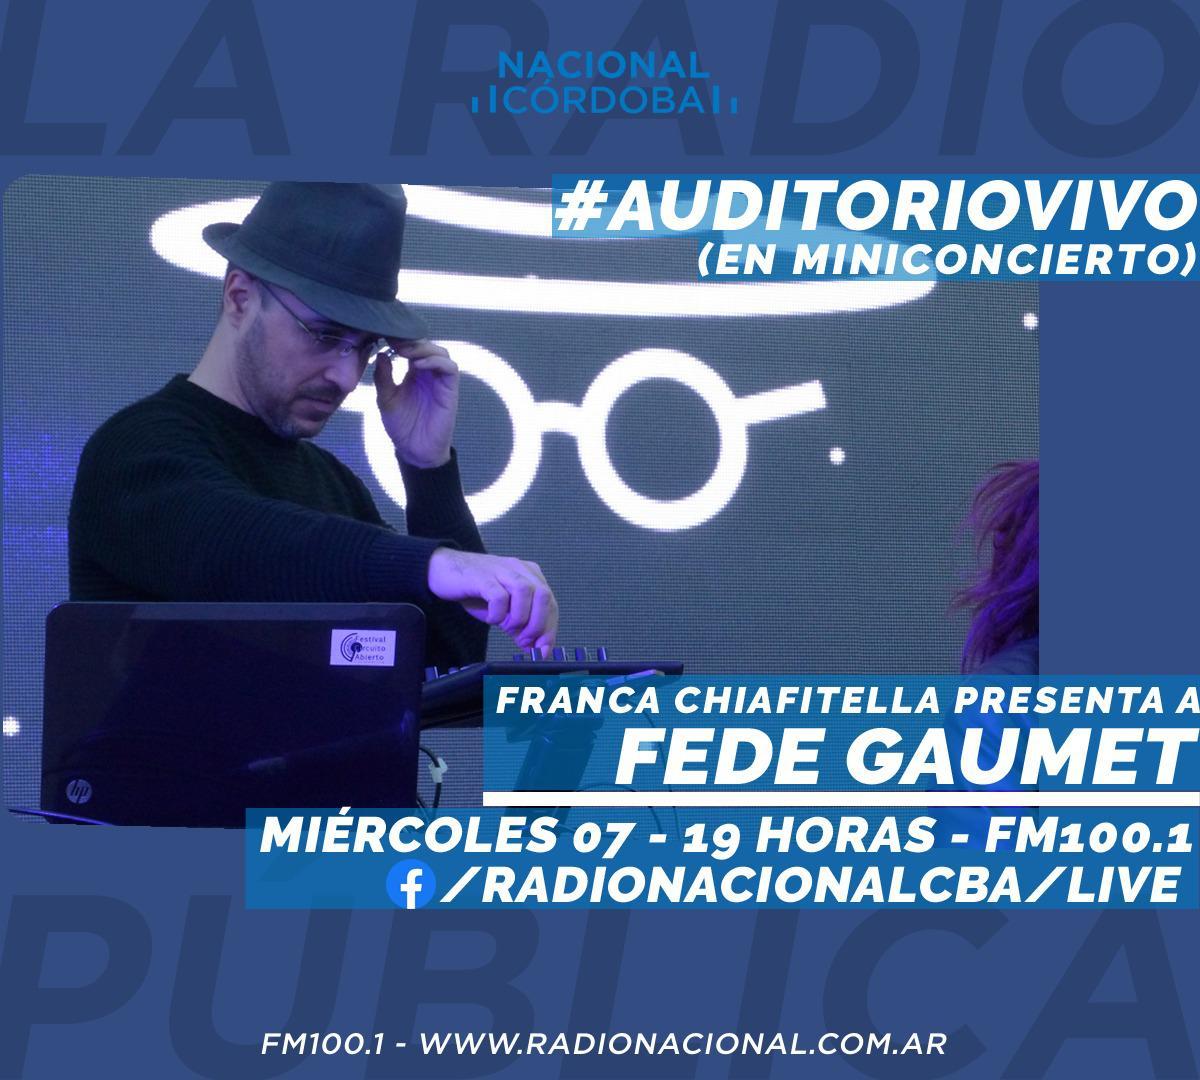 Auditorio Vivo Radio Nacional Fede Gaumet